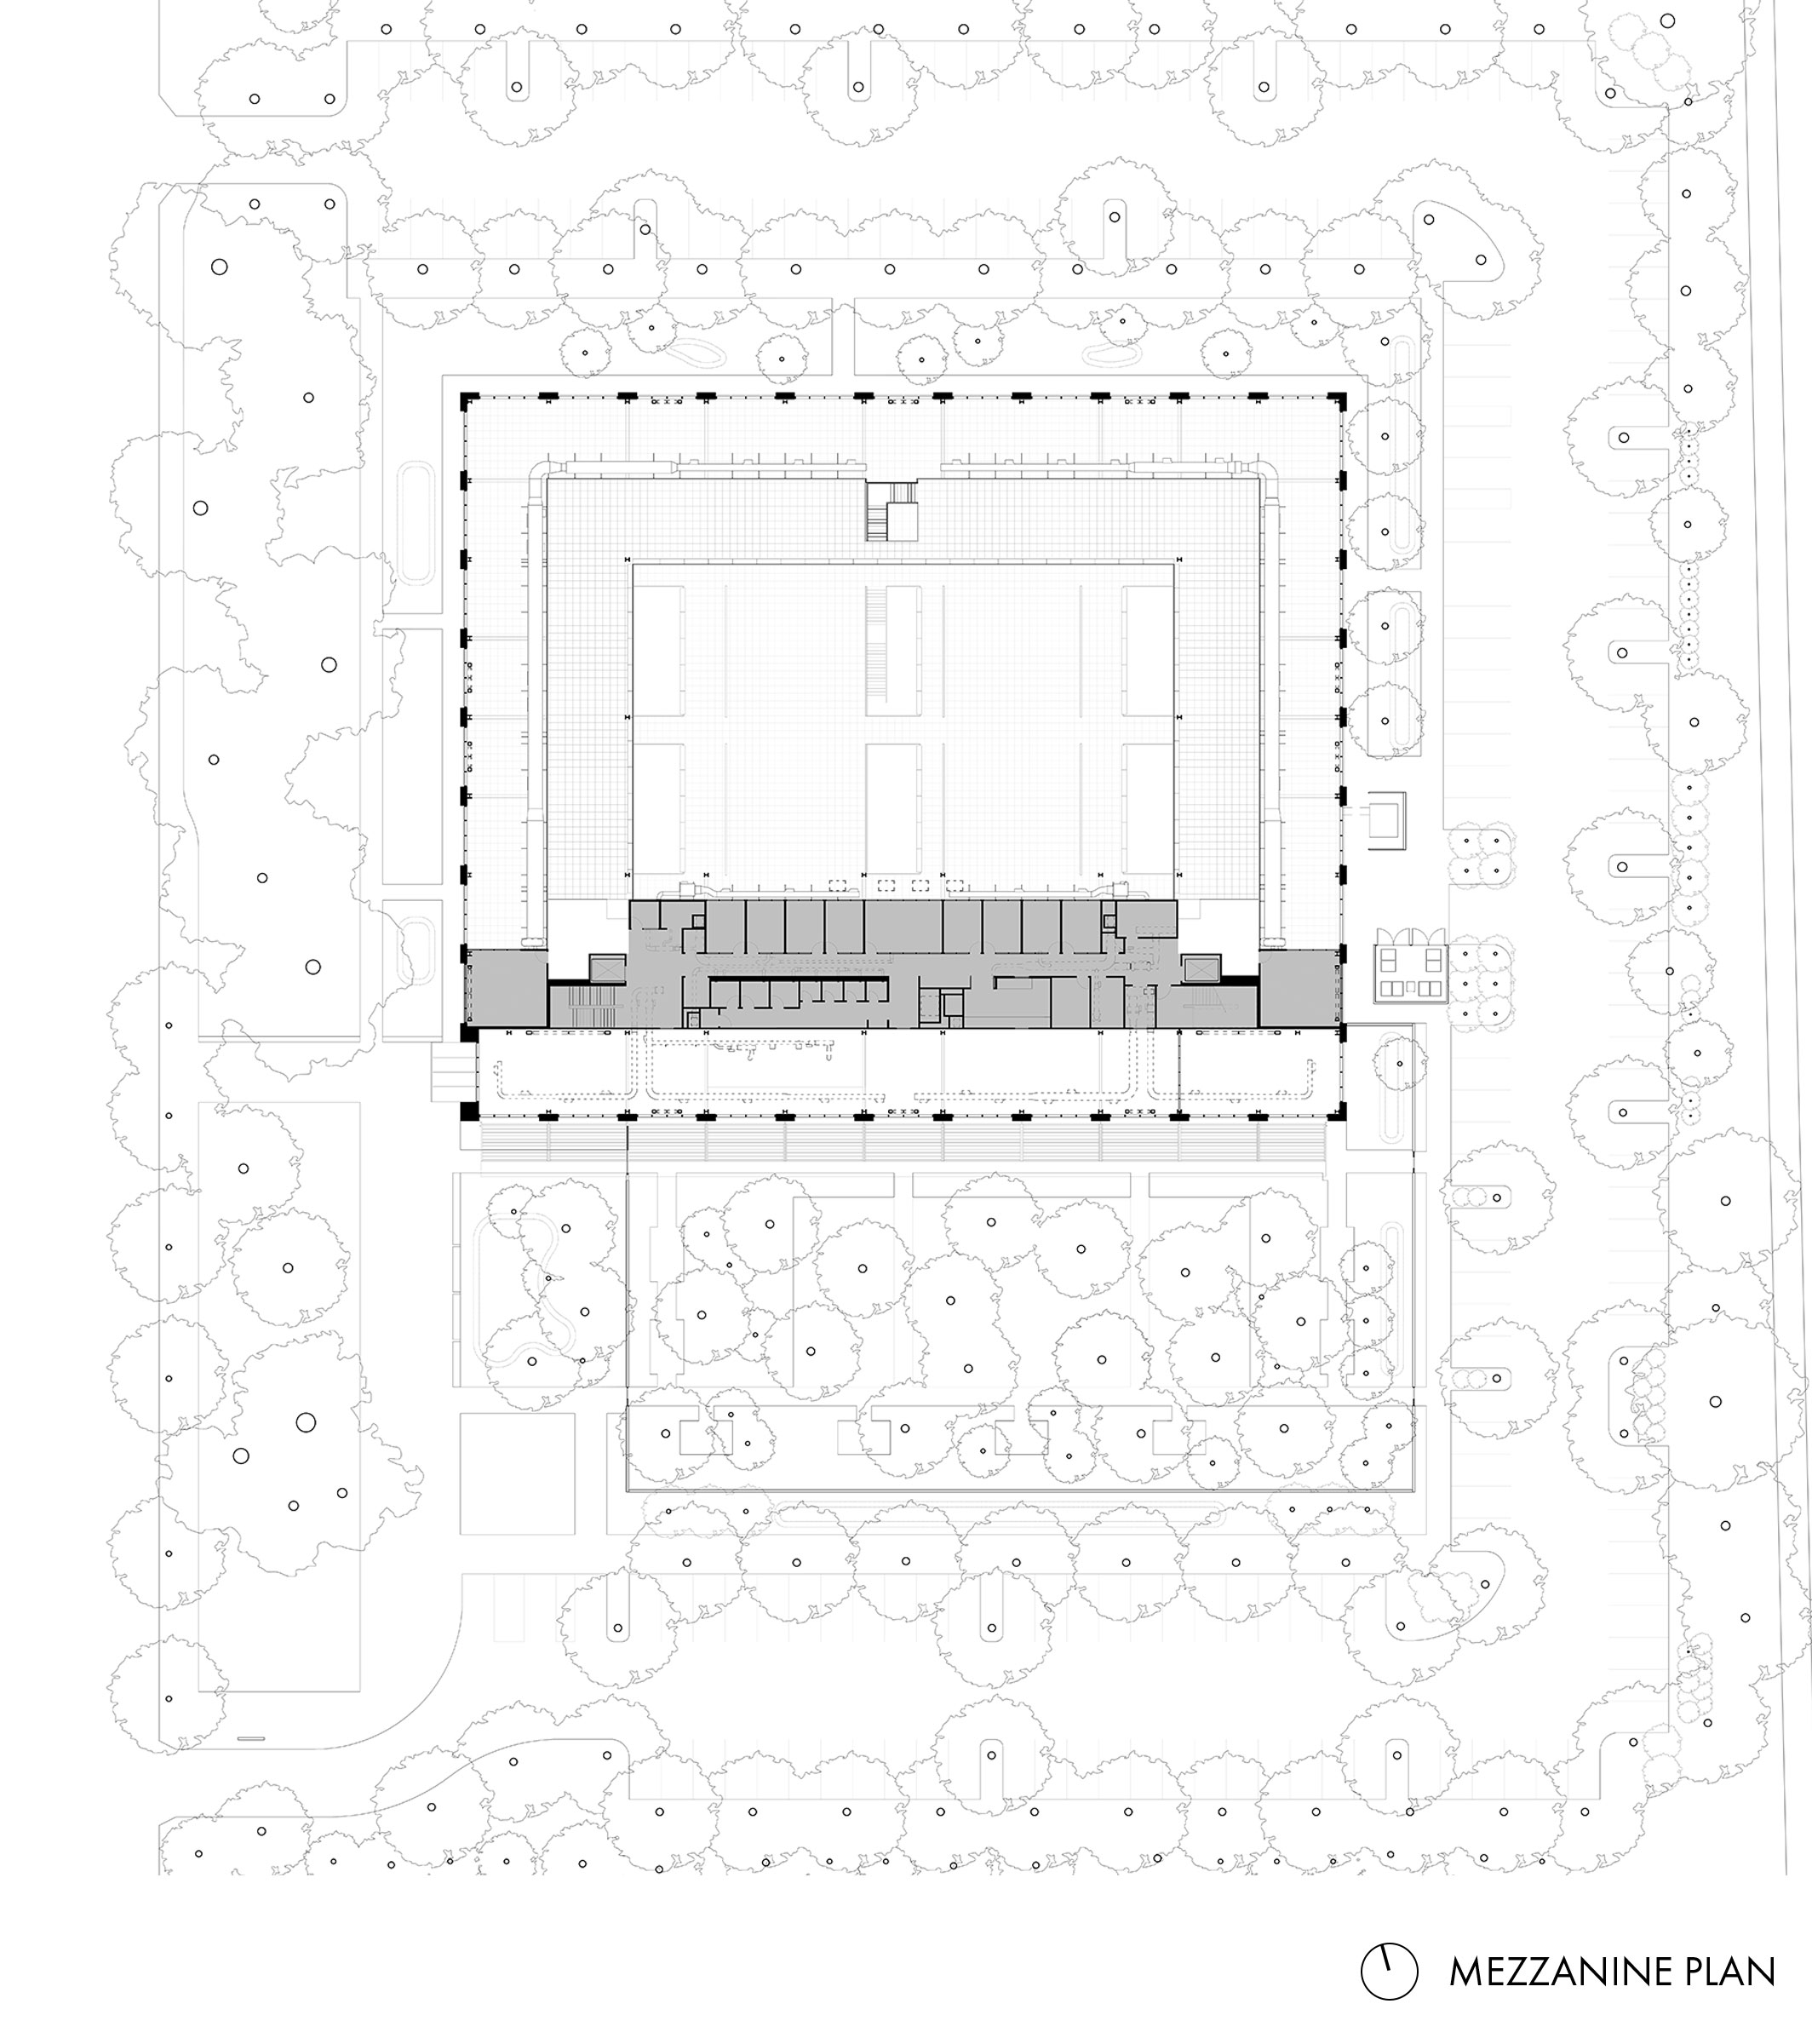 Google at 1212 Bordeaux Mezzanine Plan